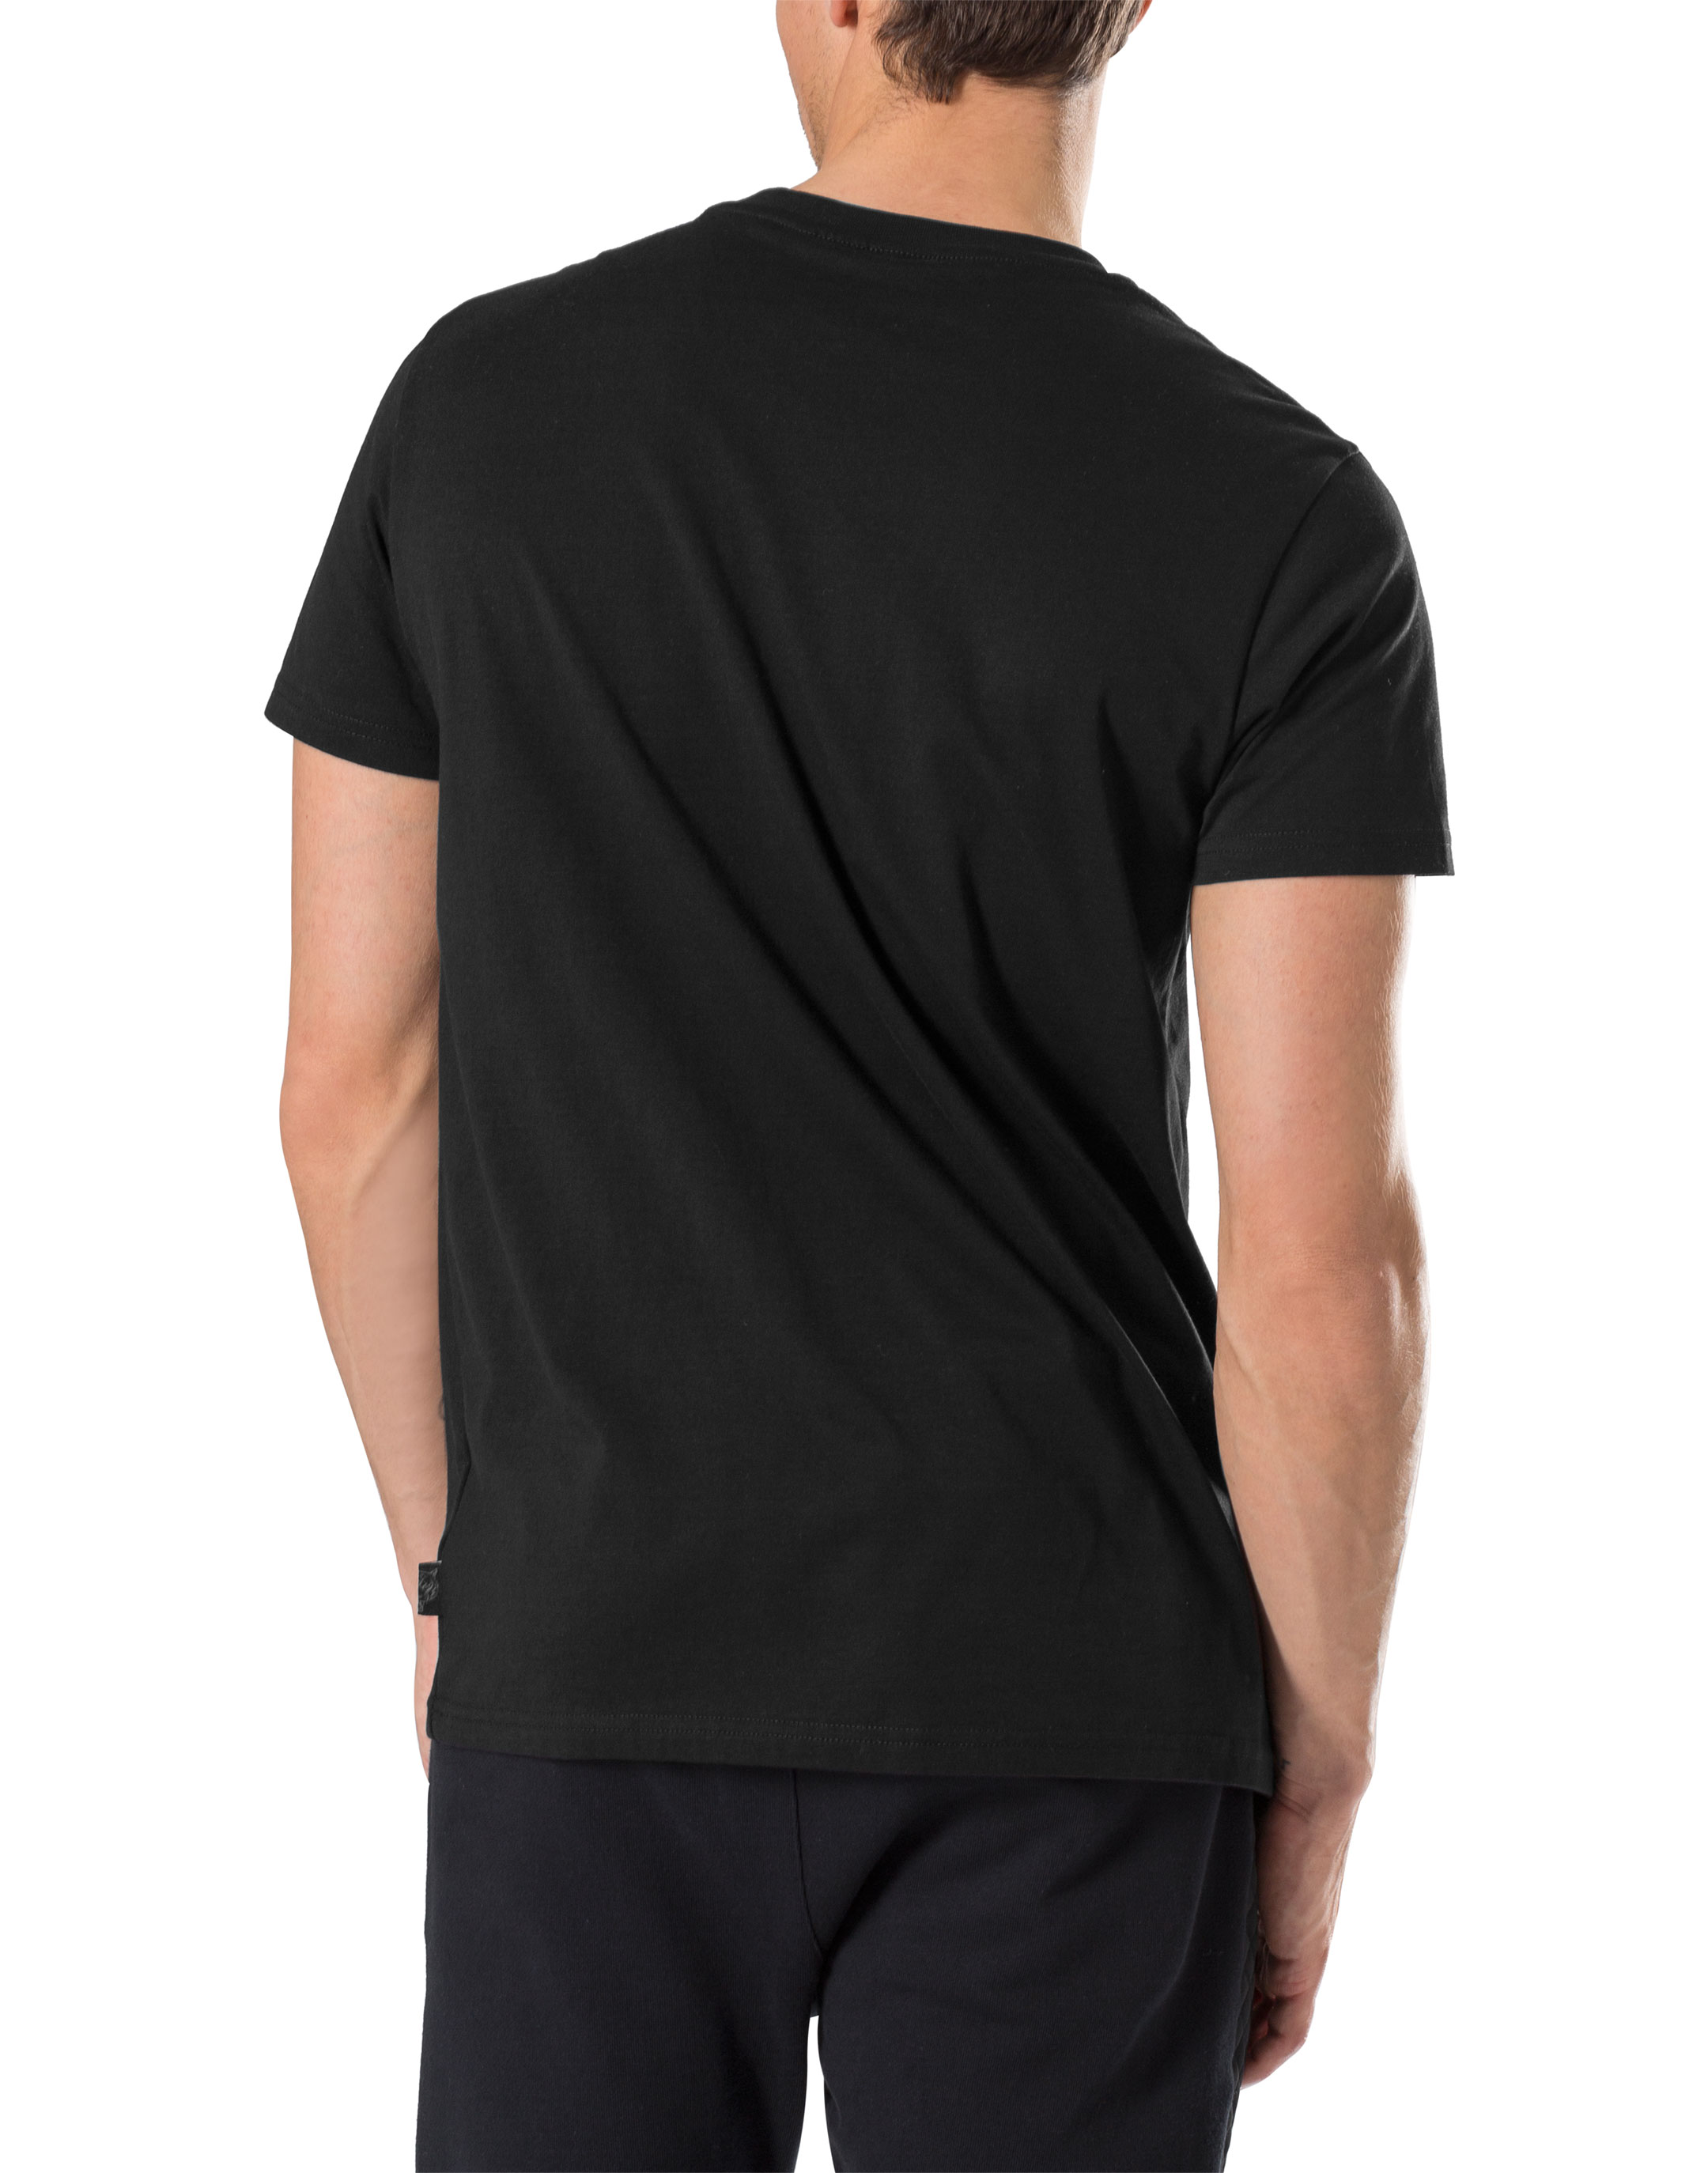 Black t shirt round neck - T Shirt Round Neck Ss Football